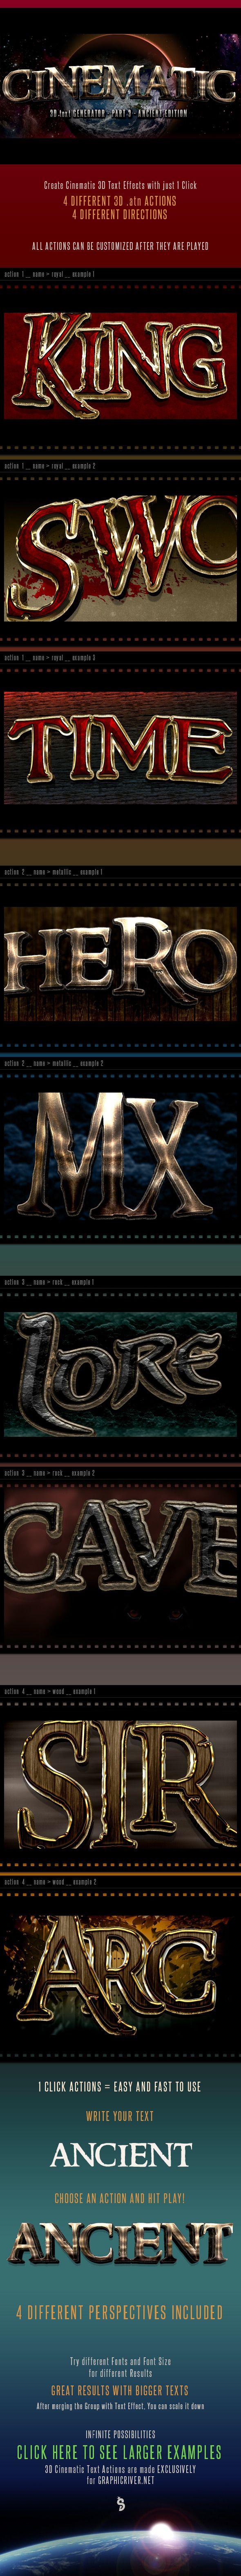 3D Cinematic Text Generator 3 - Actions